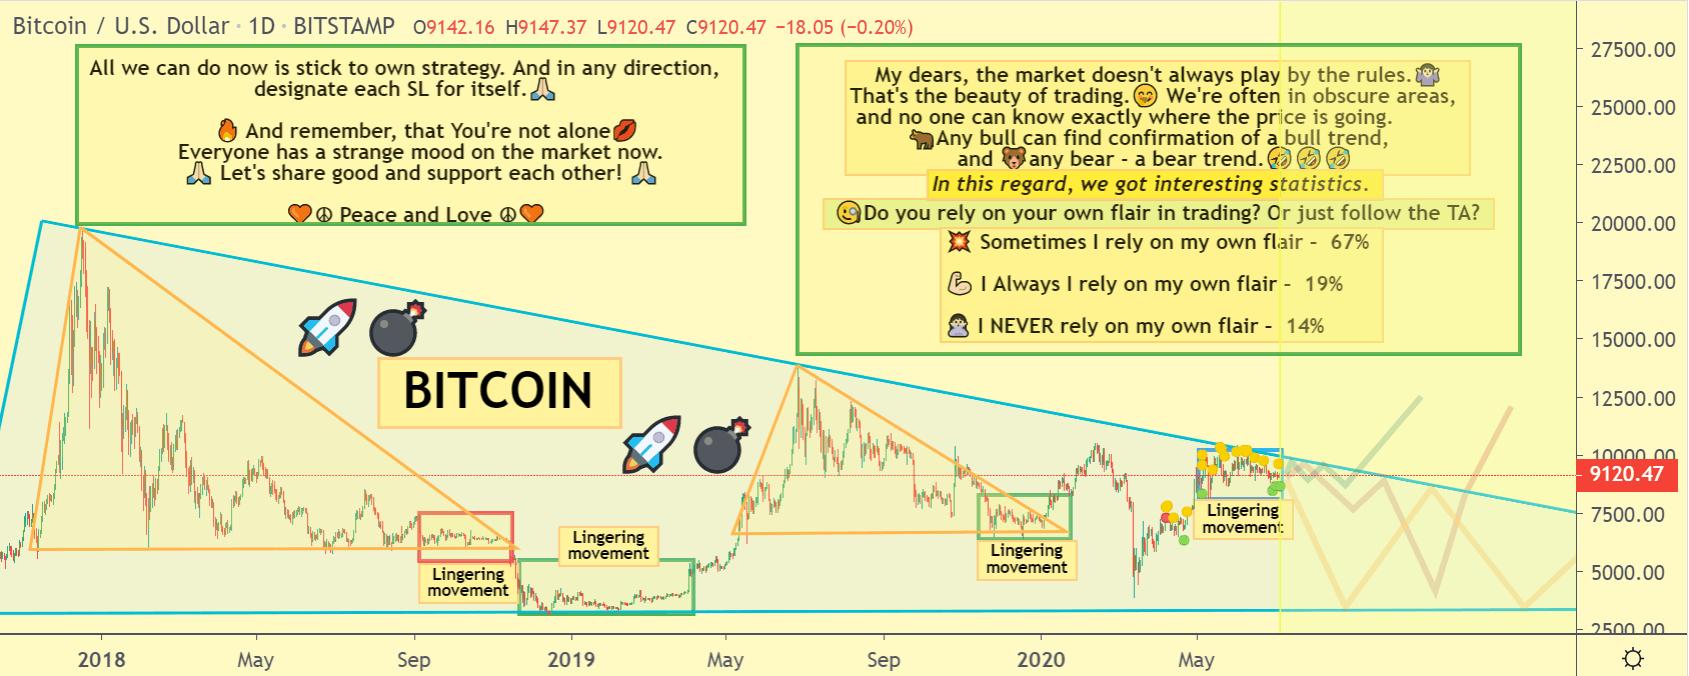 Bitcoin price chart 2 - 4 July